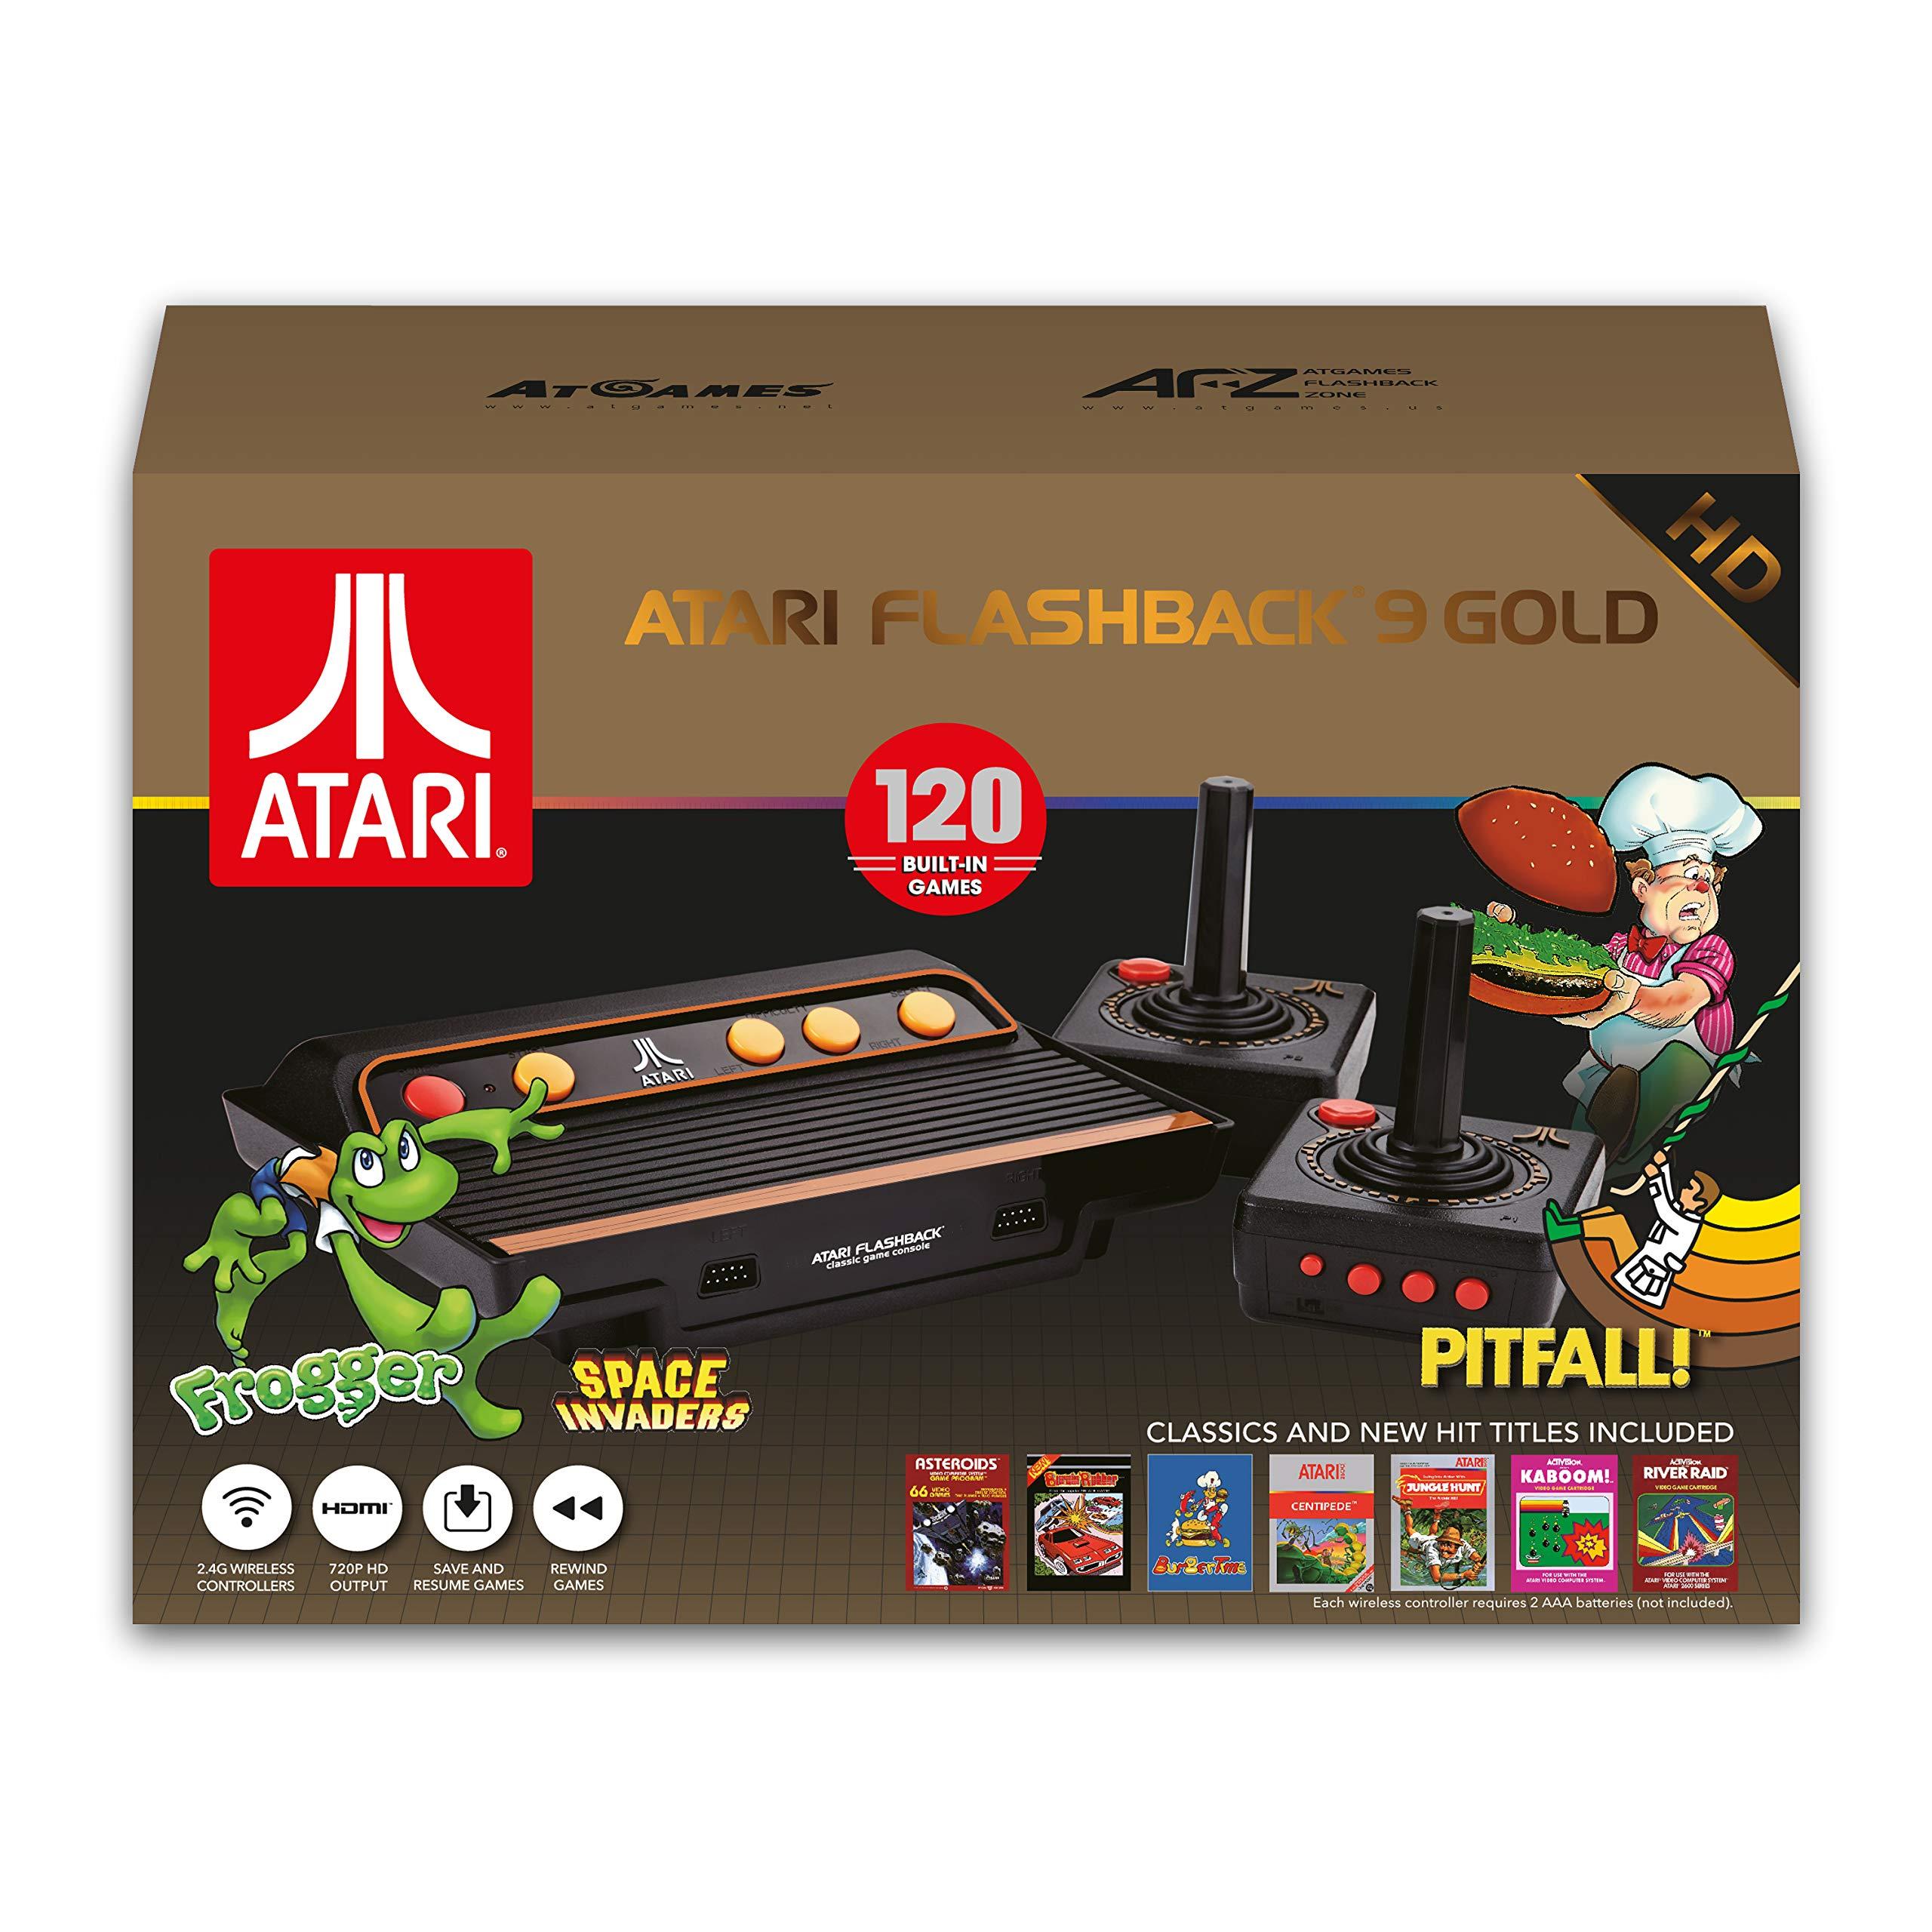 Atari Flashback 9 Gold - Electronic Games